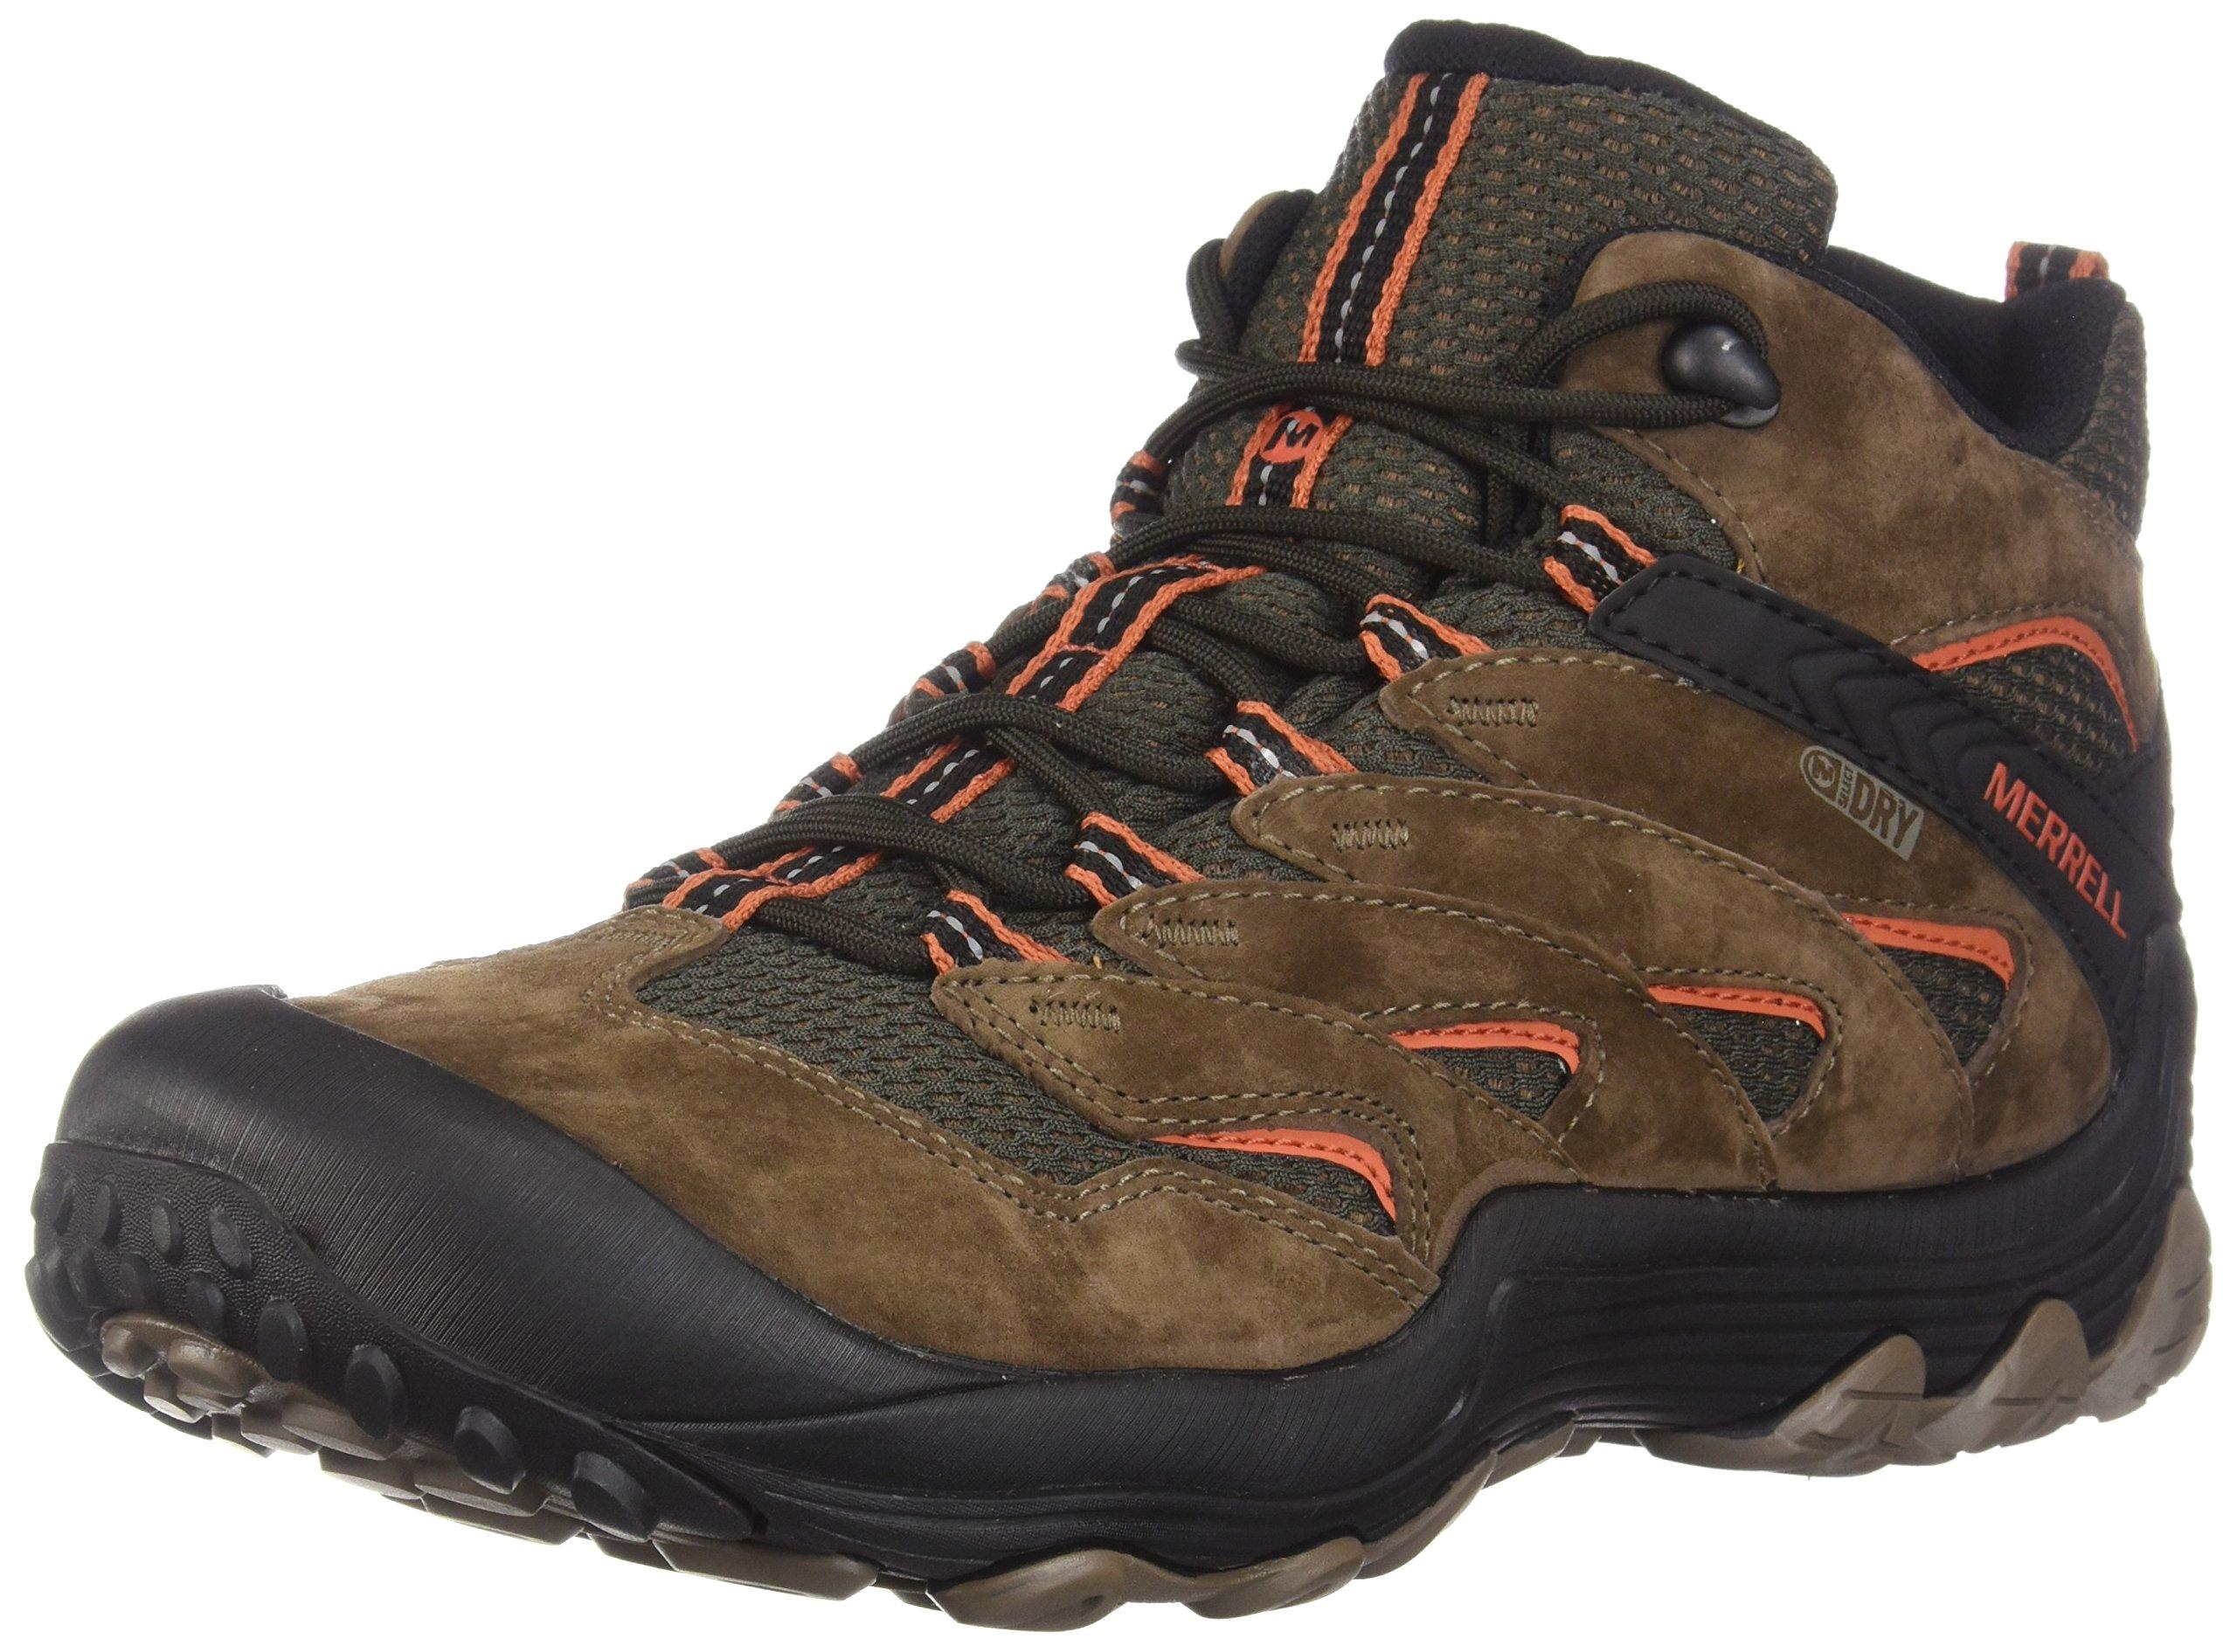 Merrell Men's Chameleon 7 Limit Mid Waterproof Hiking Boot, Stone, 11.5 Medium US